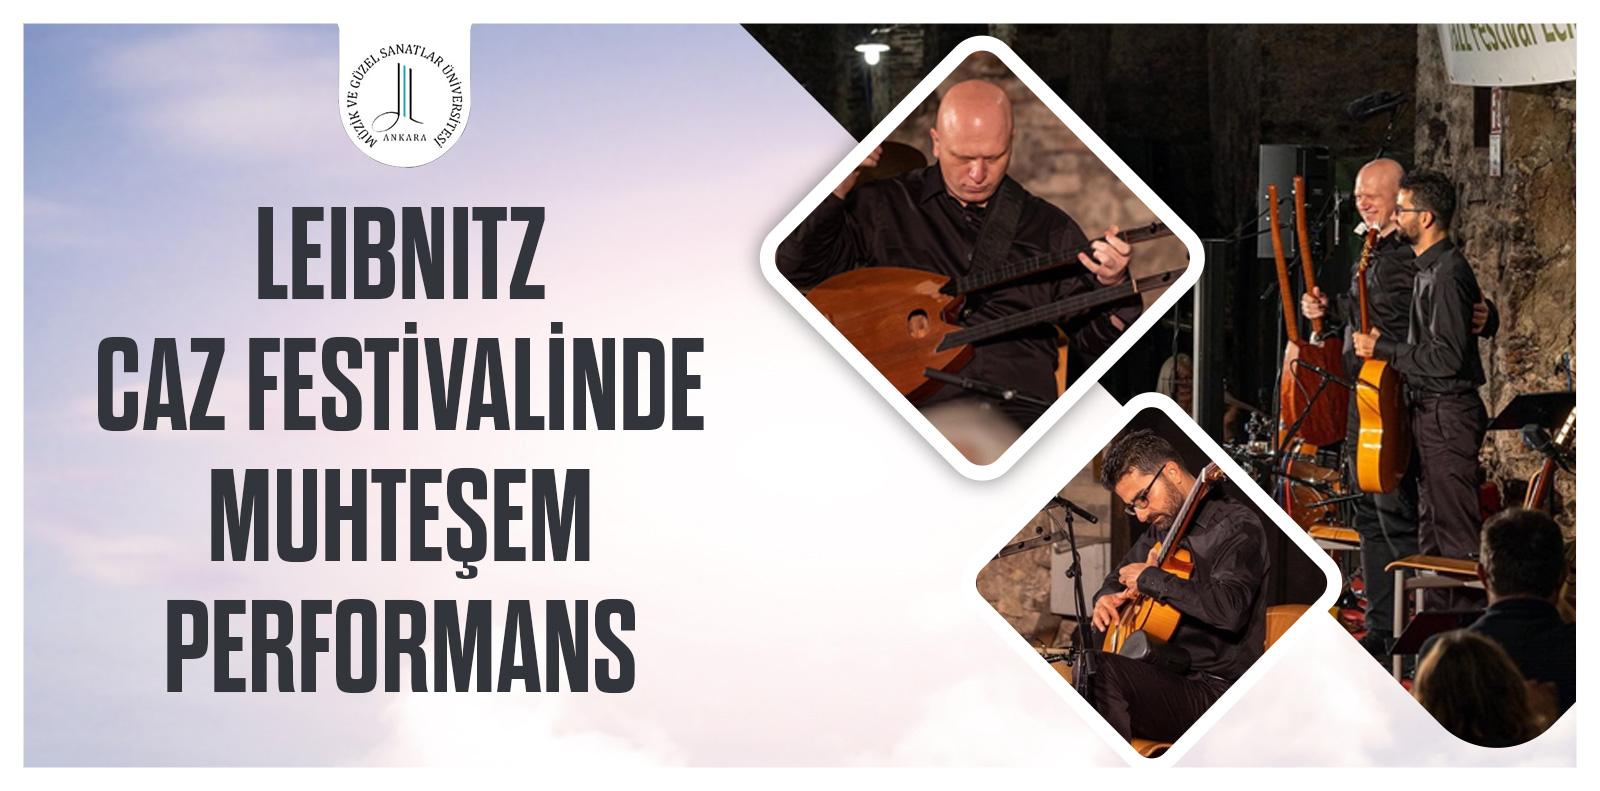 Leibnitz Caz Festivalinde Muhteşem Performans Slid